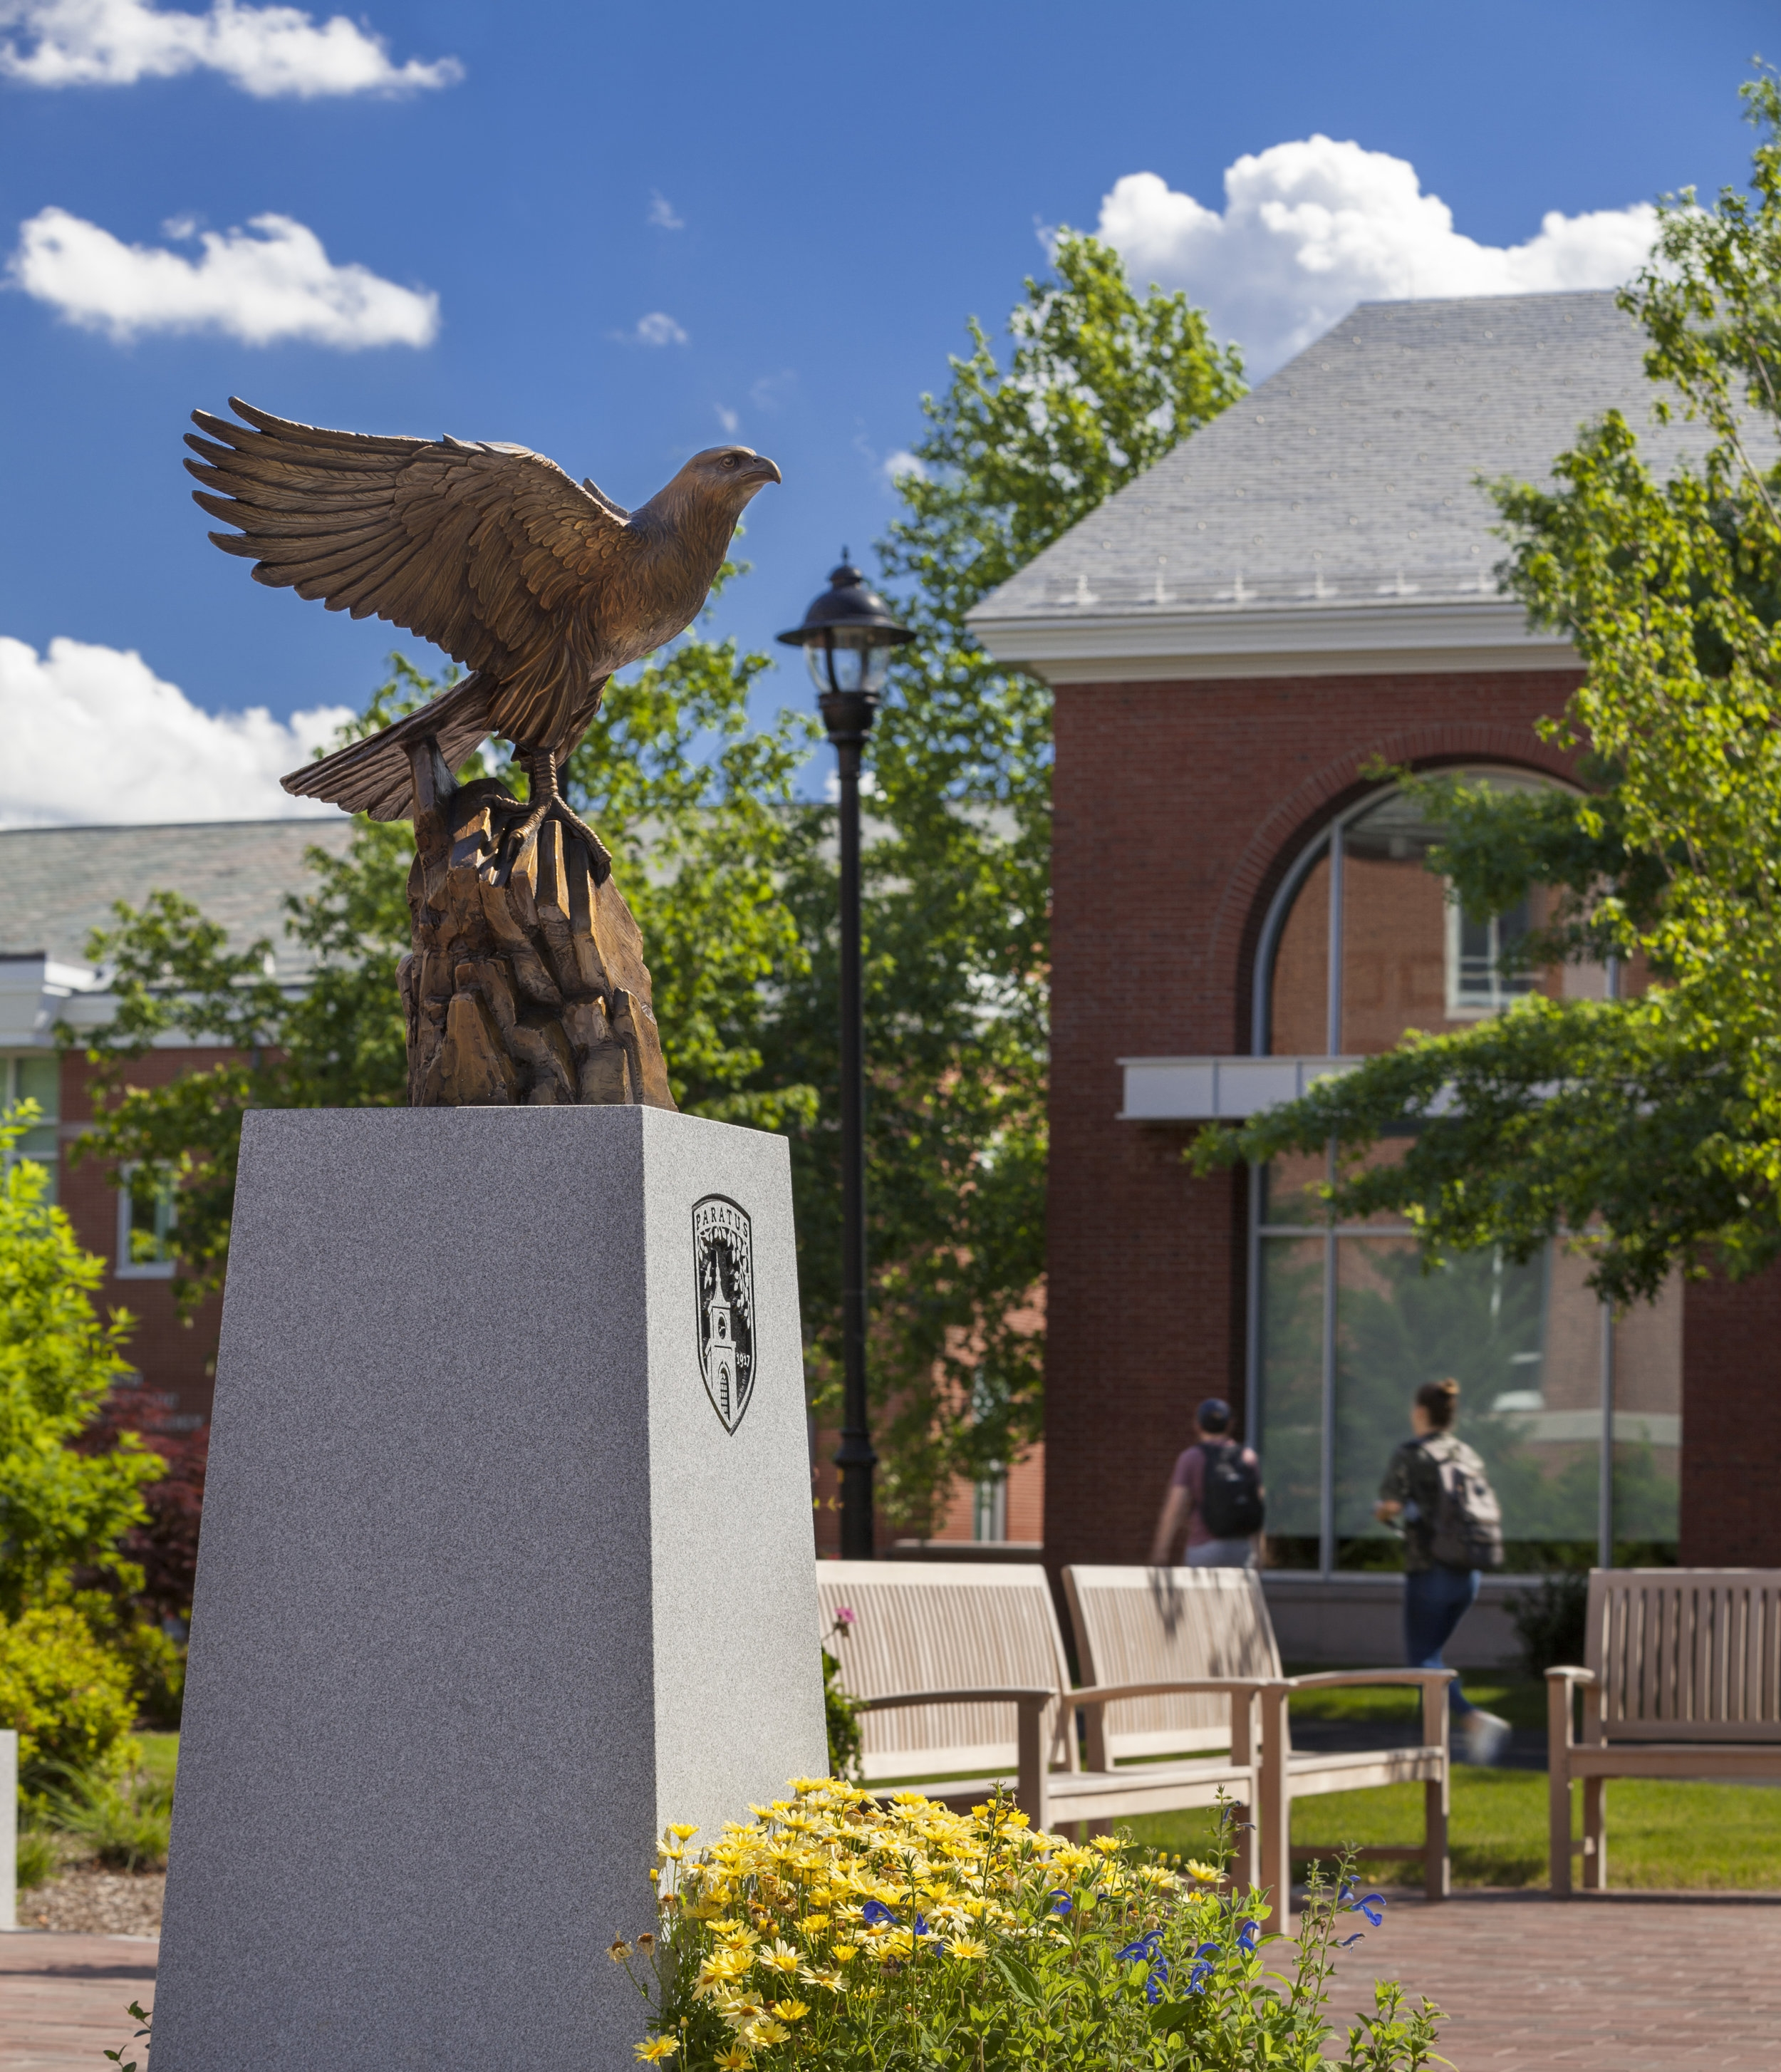 Falcon sculpture by Skylight Studios